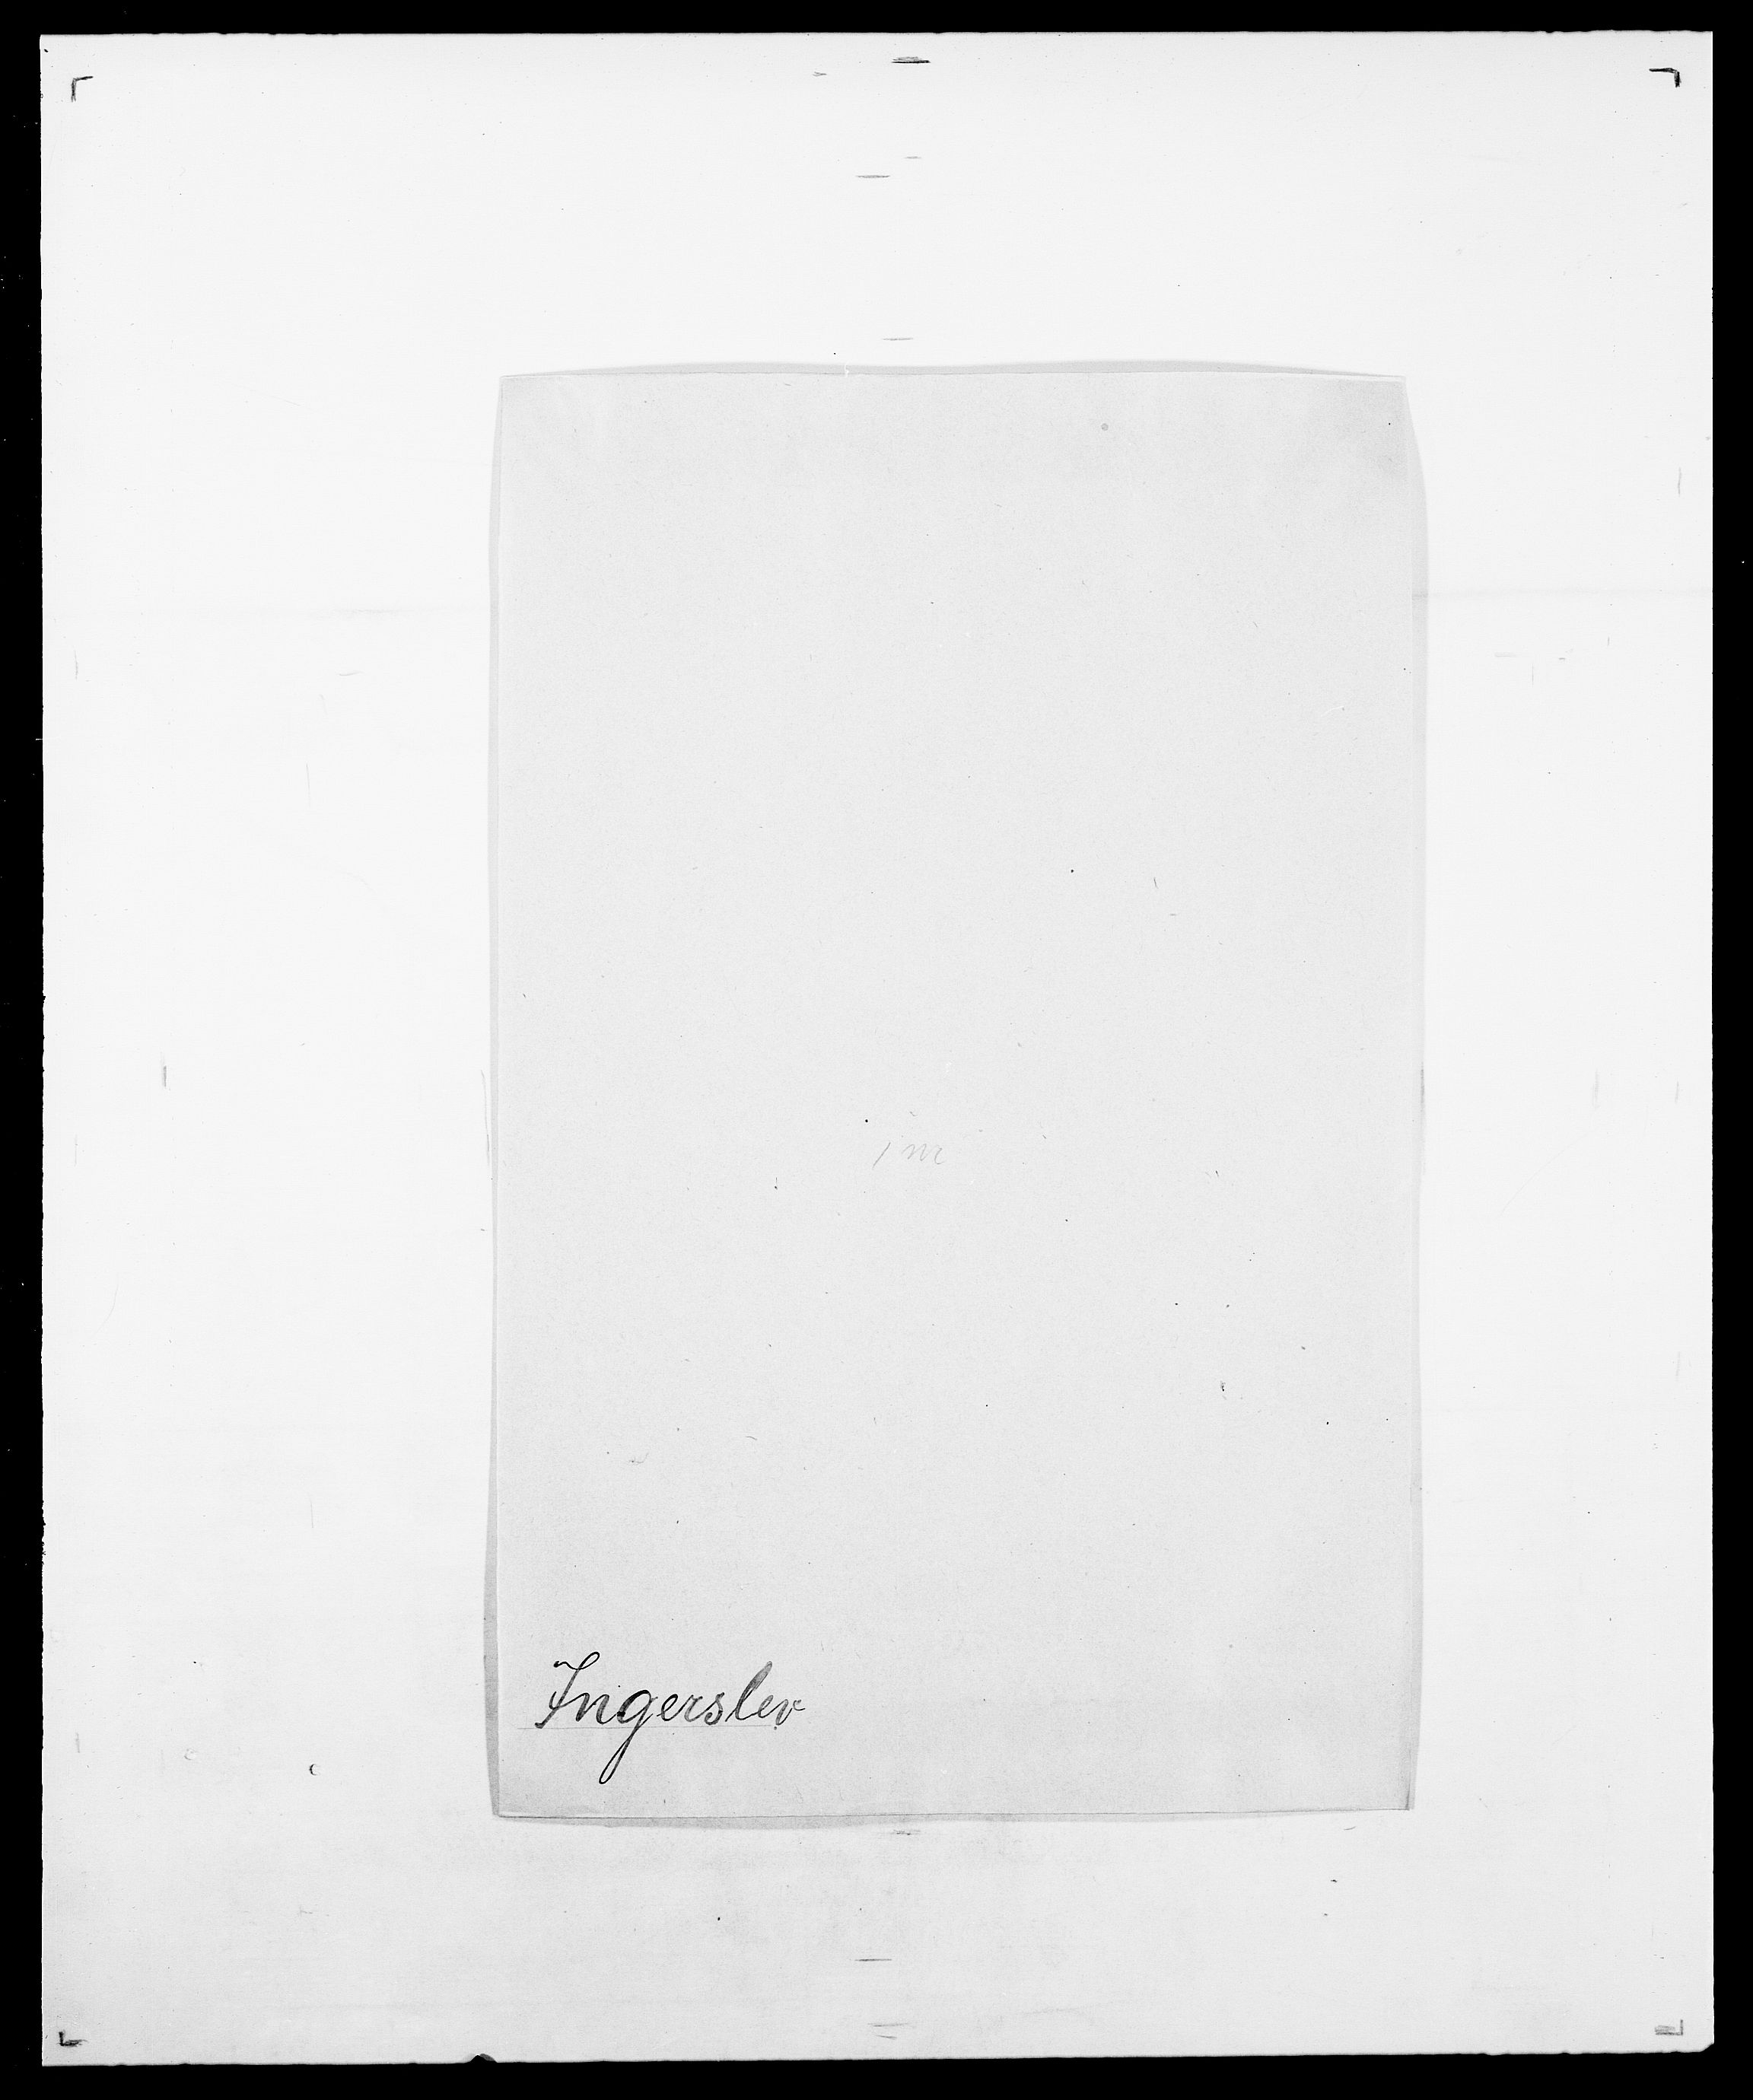 SAO, Delgobe, Charles Antoine - samling, D/Da/L0019: van der Hude - Joys, s. 788